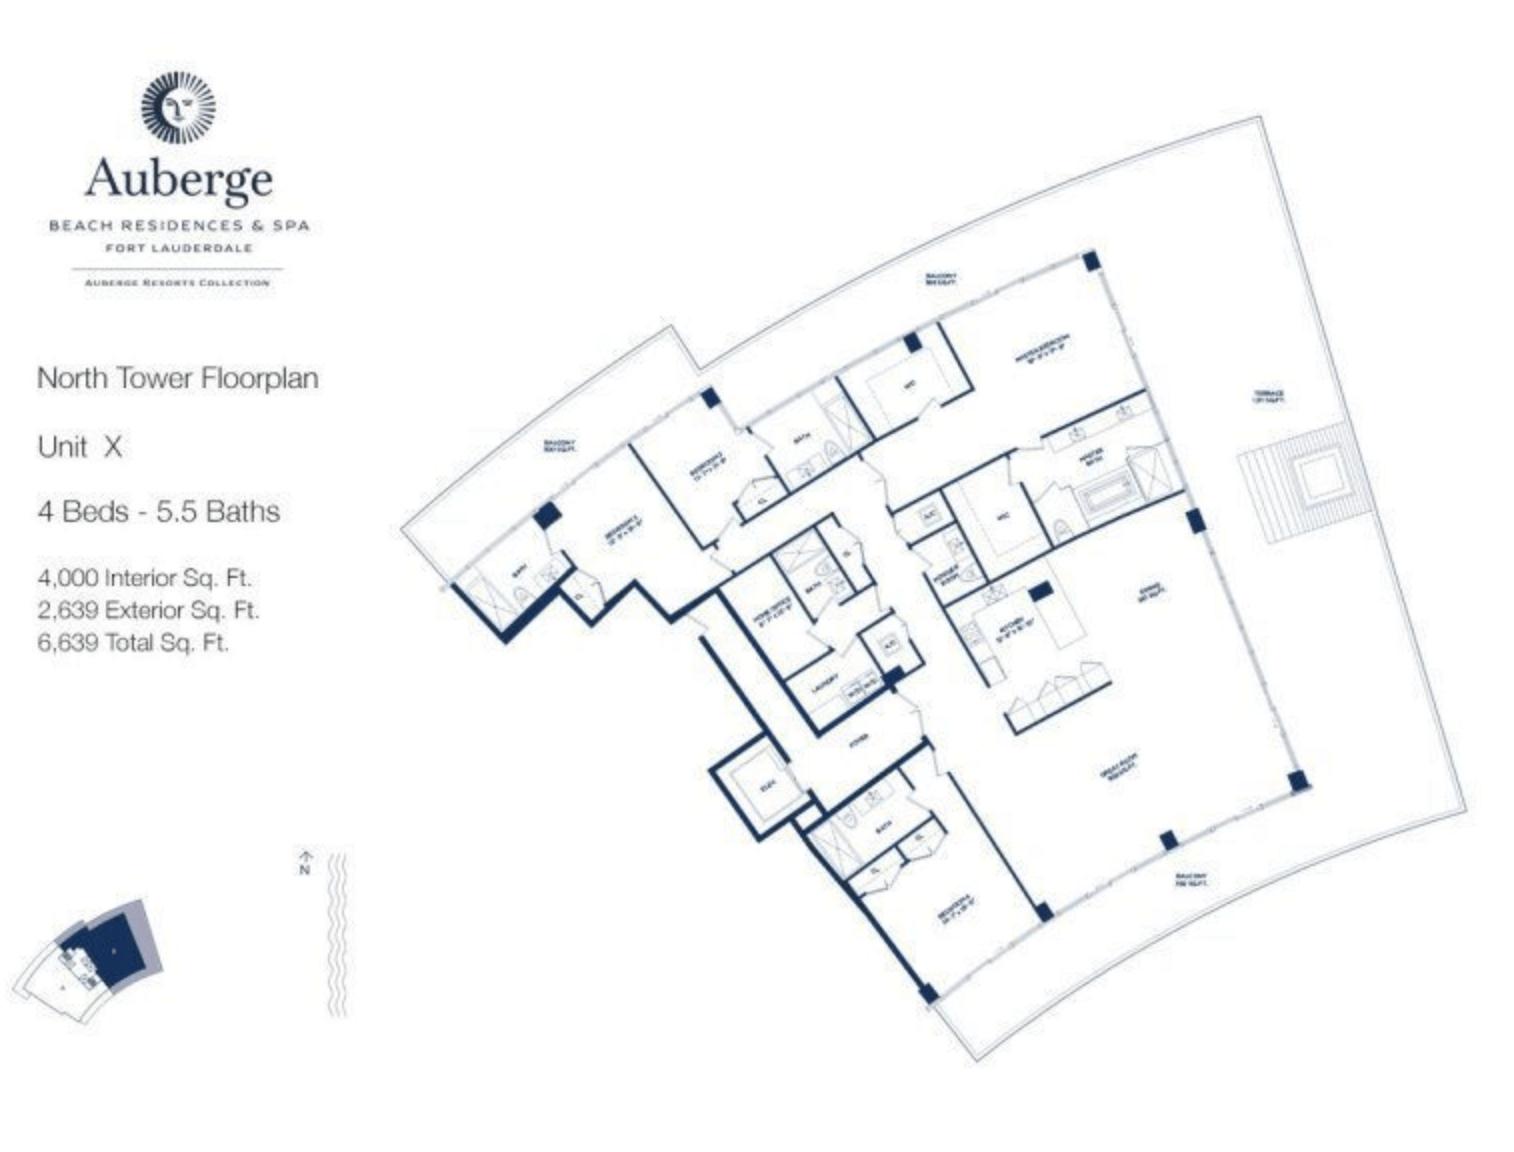 Auberge Beach Residences North Tower X | 4 Beds - 5.5 baths